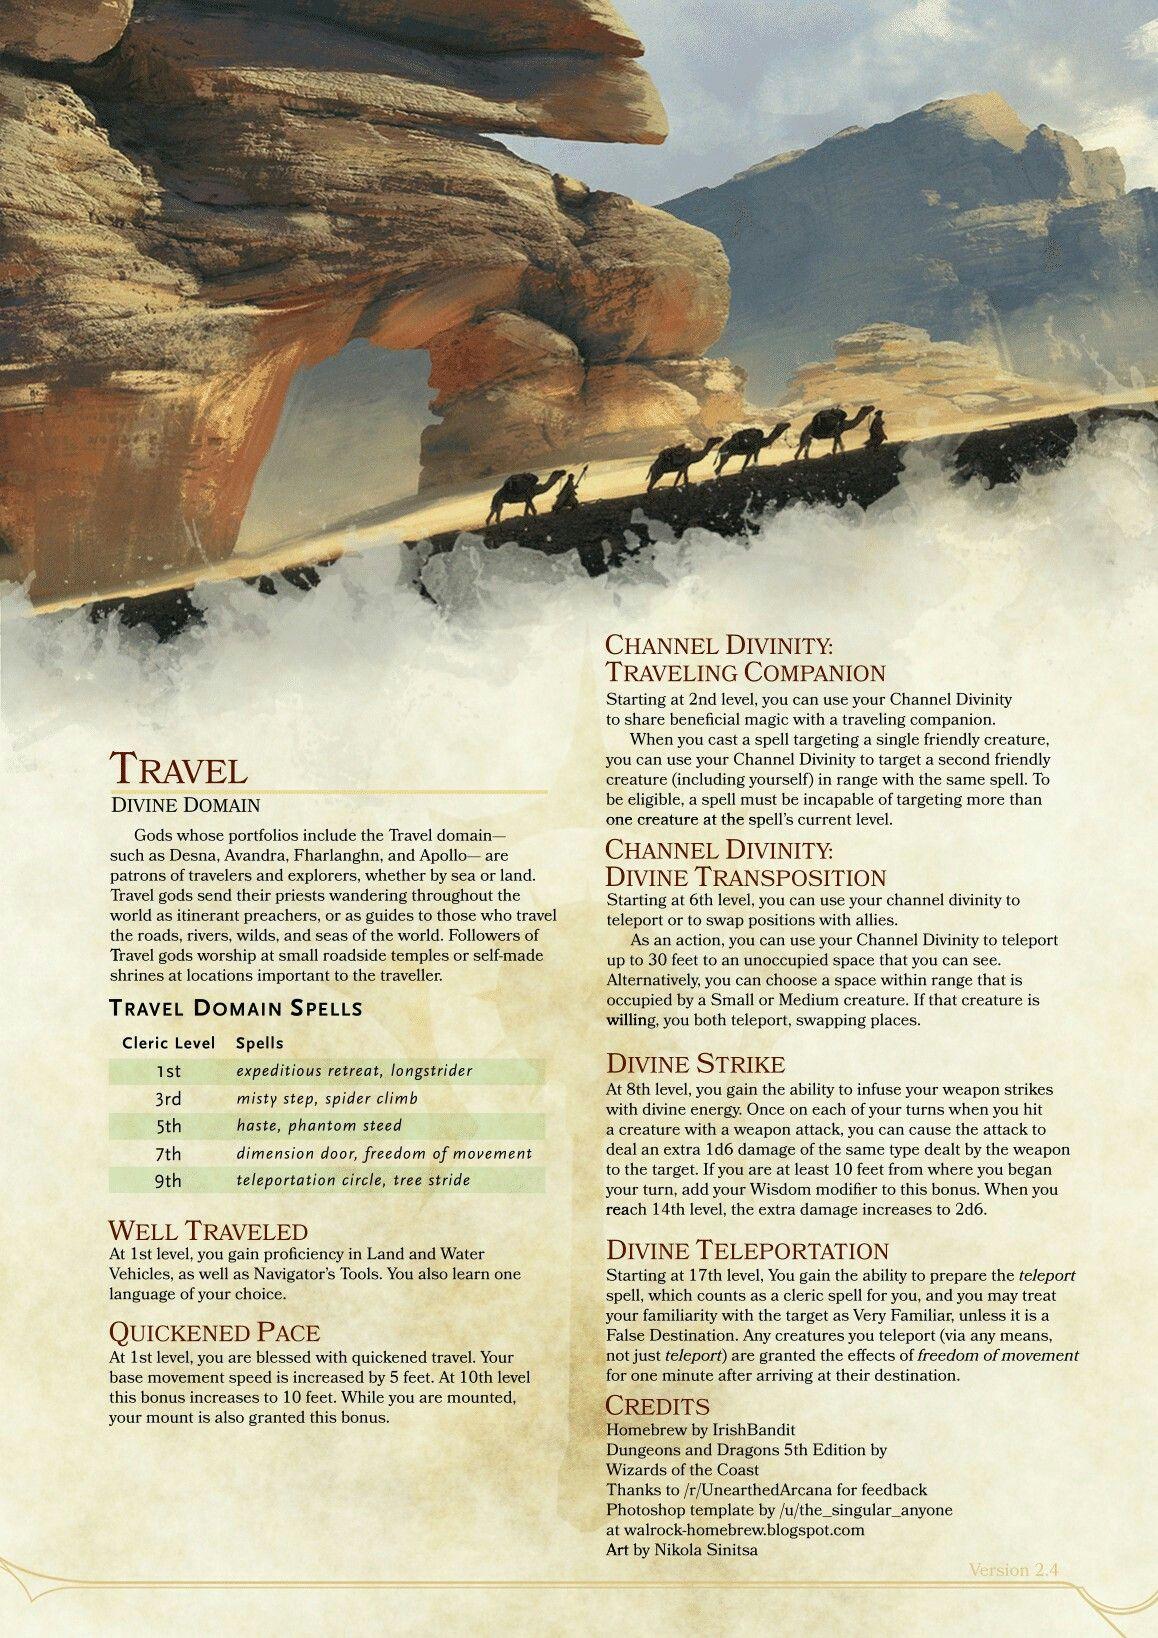 Pin by Michael Orlandini Jr on Dungeons & Dragons | Pinterest | RPG ...